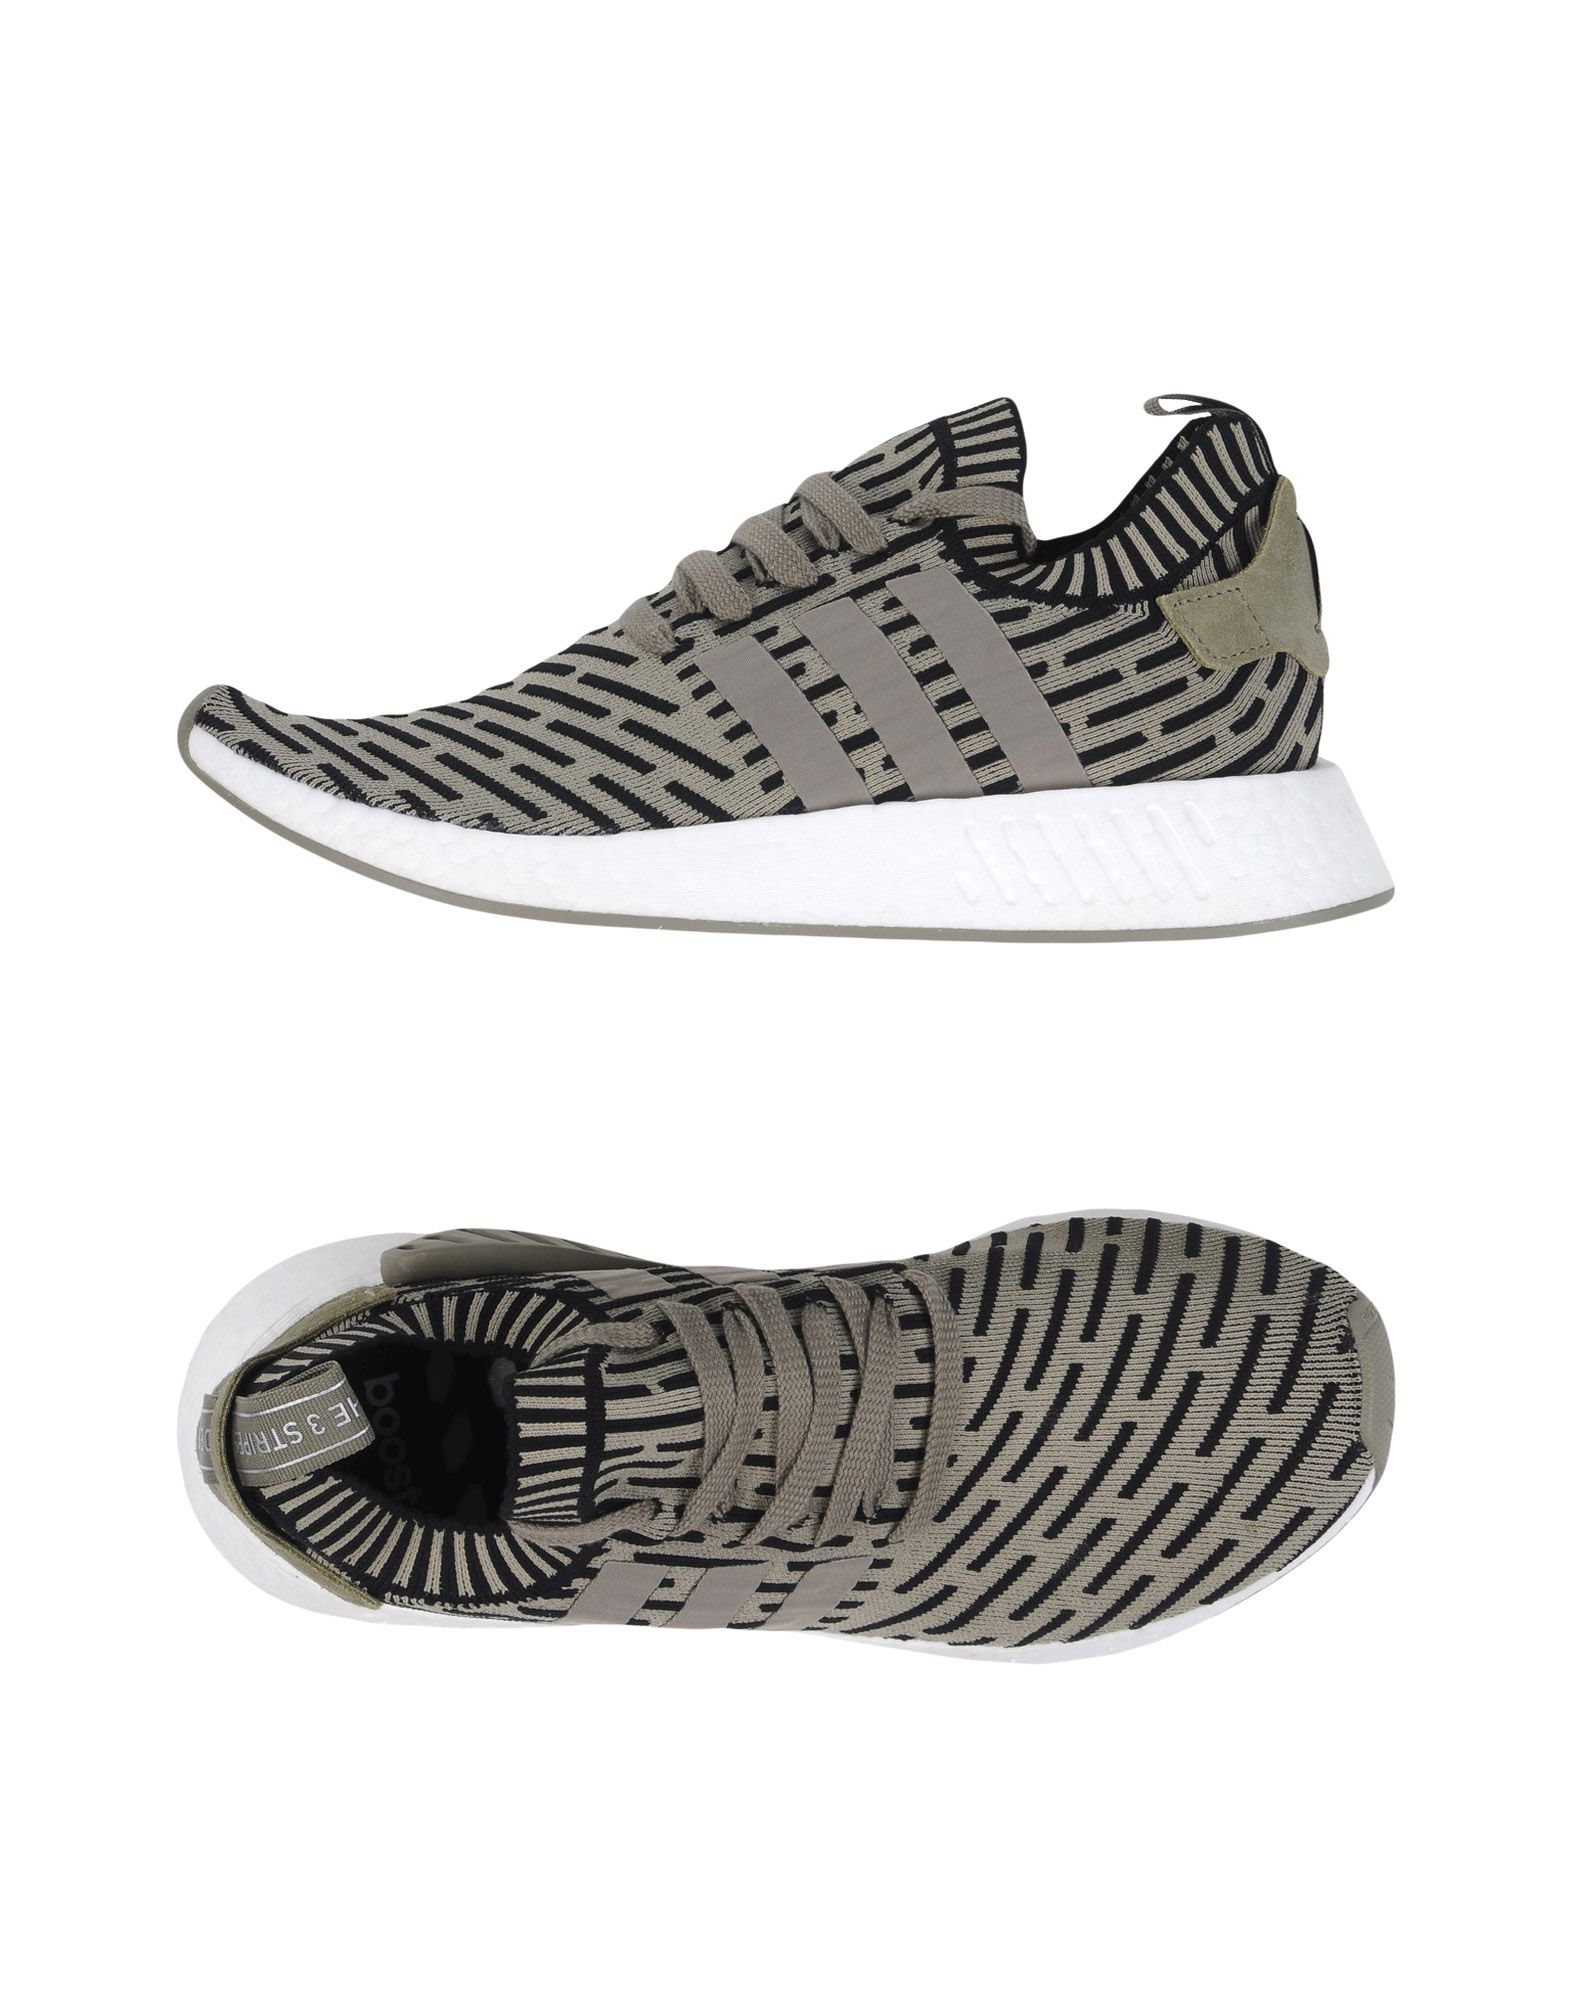 Adidas Originals Nmd_R2 Pk - Sneakers - Men Adidas Originals Originals Originals Sneakers online on  Australia - 11200330AJ fd8c54